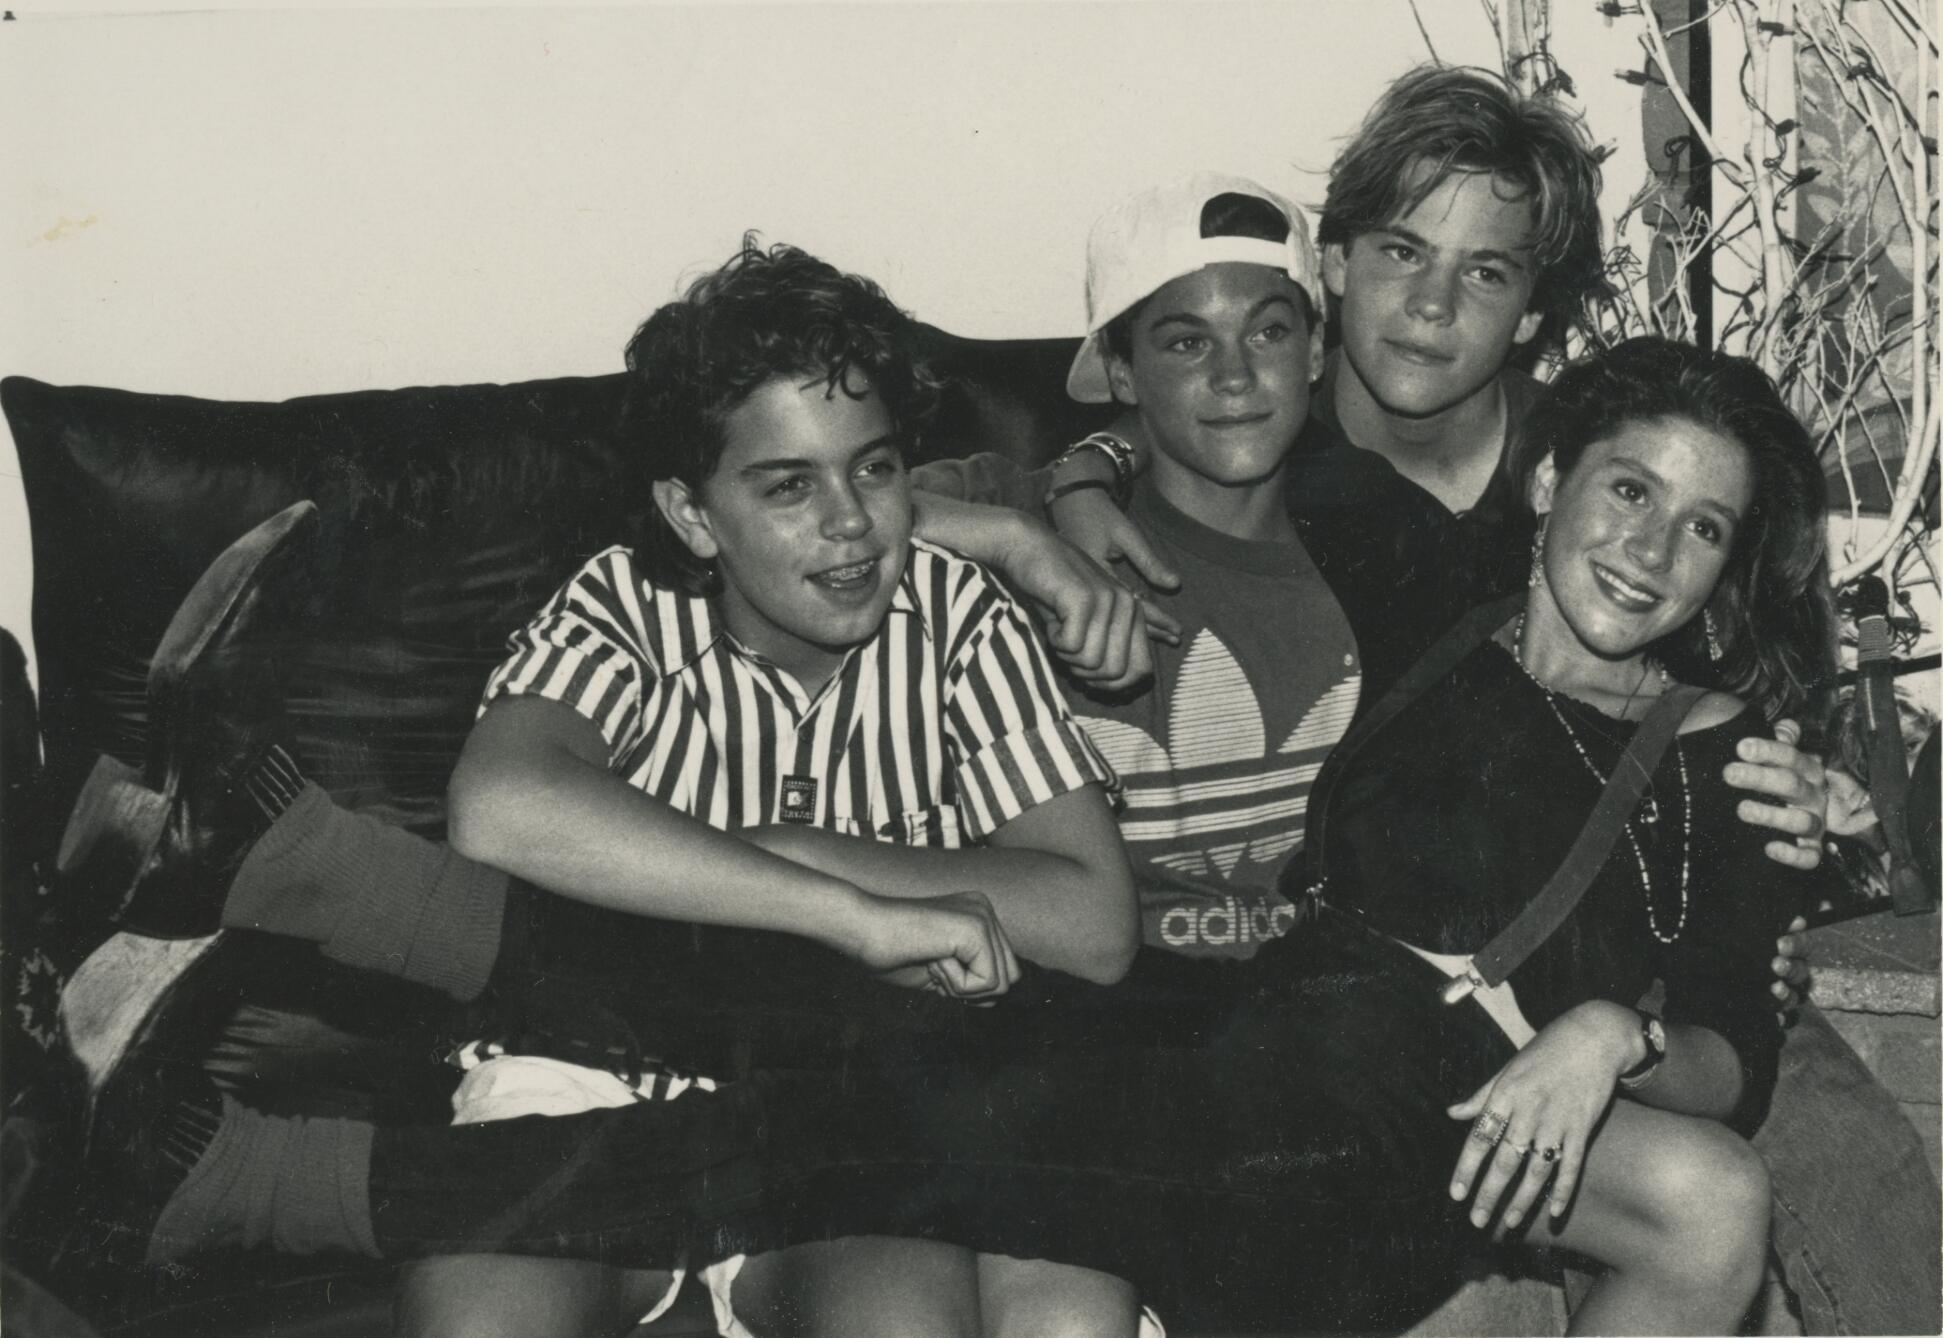 Alexander Polinsky, Stephen Dorff, Brian Austin Green and Soleil Moon Frye